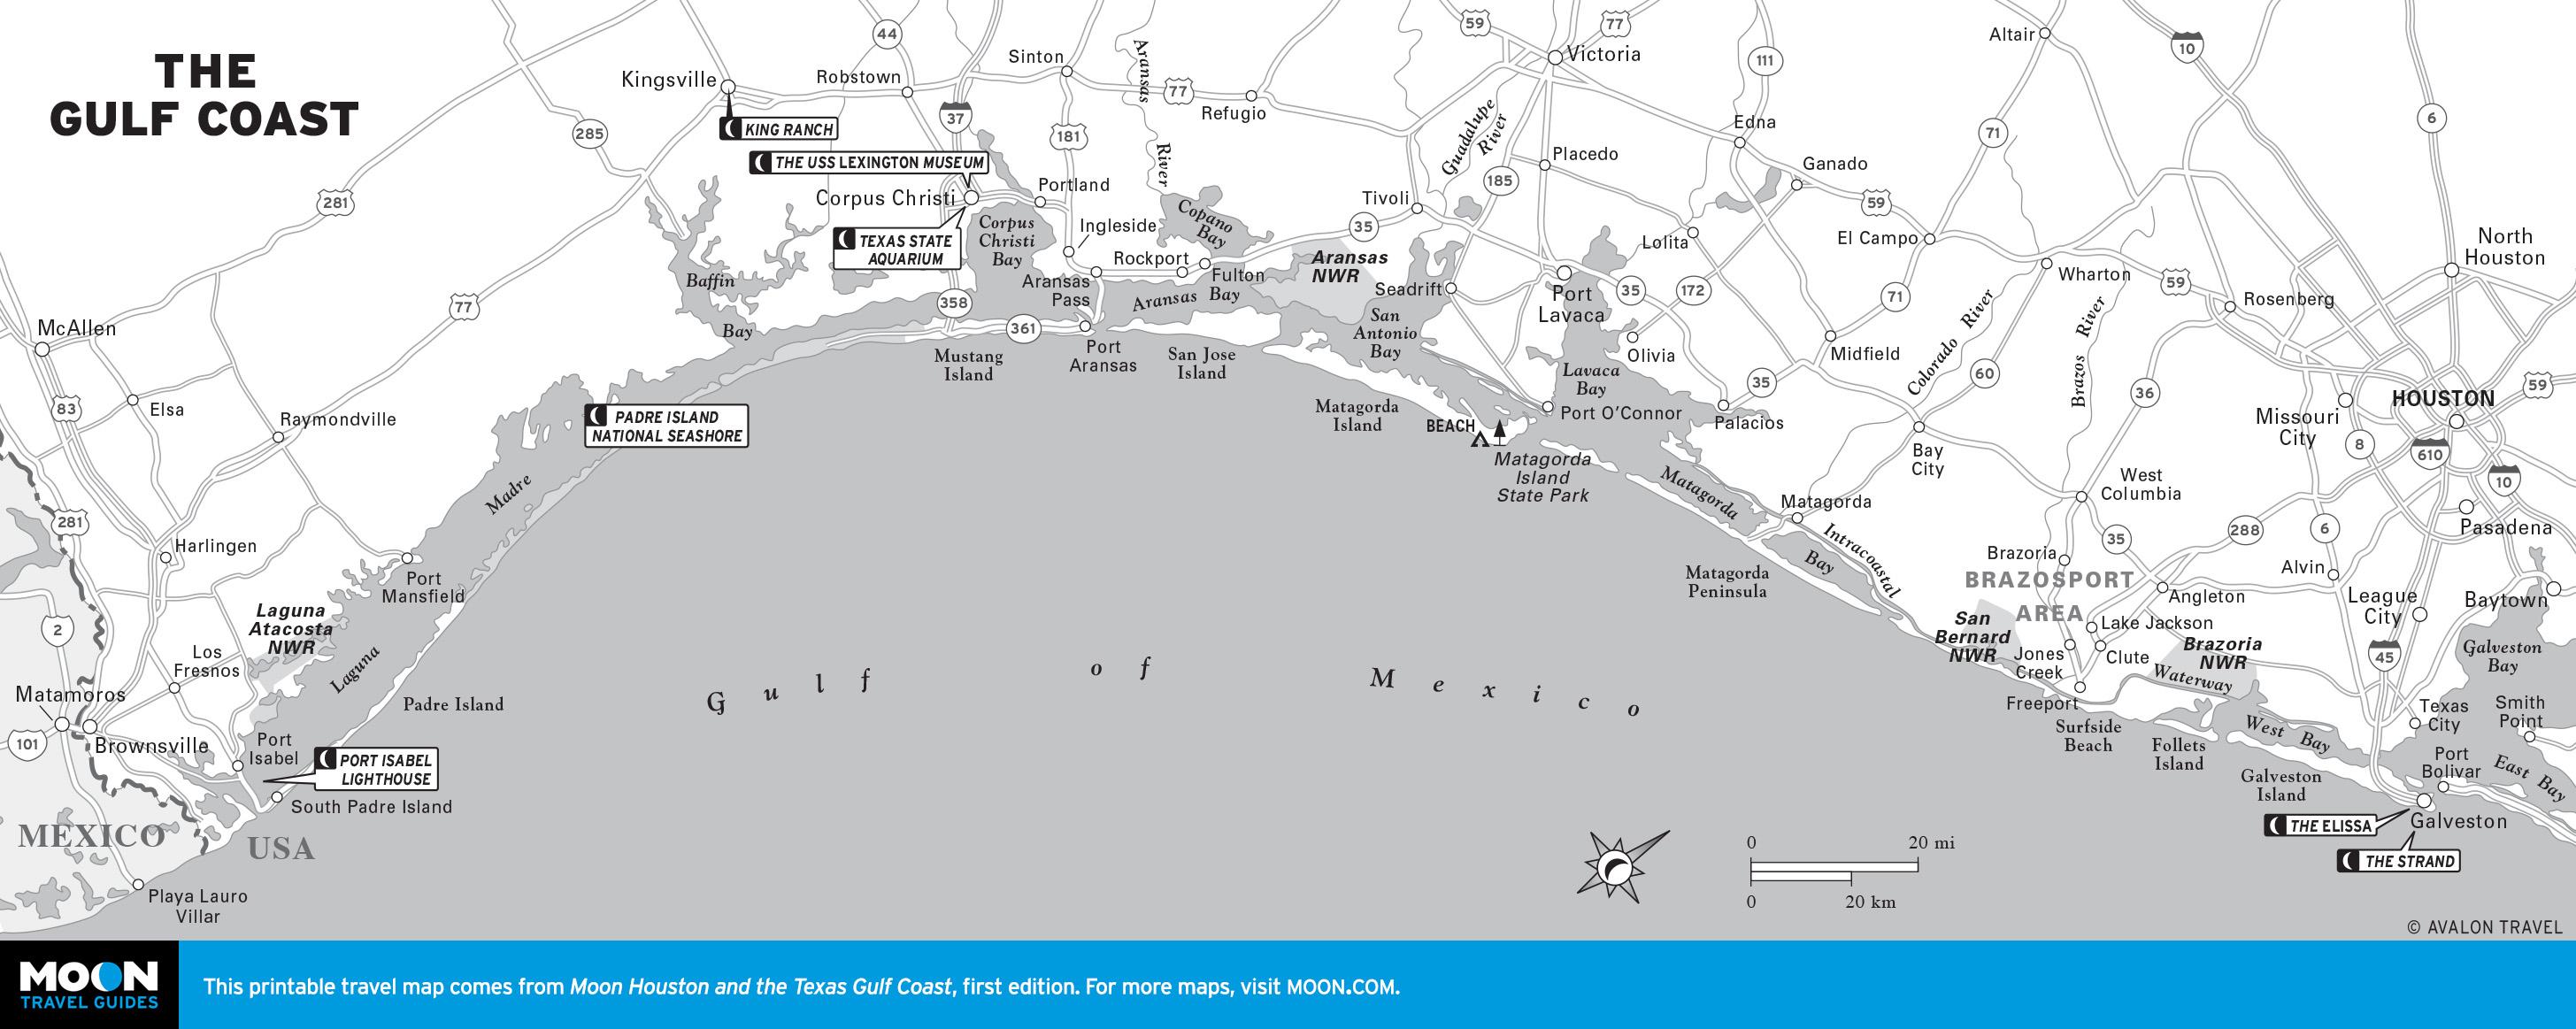 Map Of Texas Gulf Coast Beaches | Business Ideas 2013 - Map Of Texas Coastline Cities